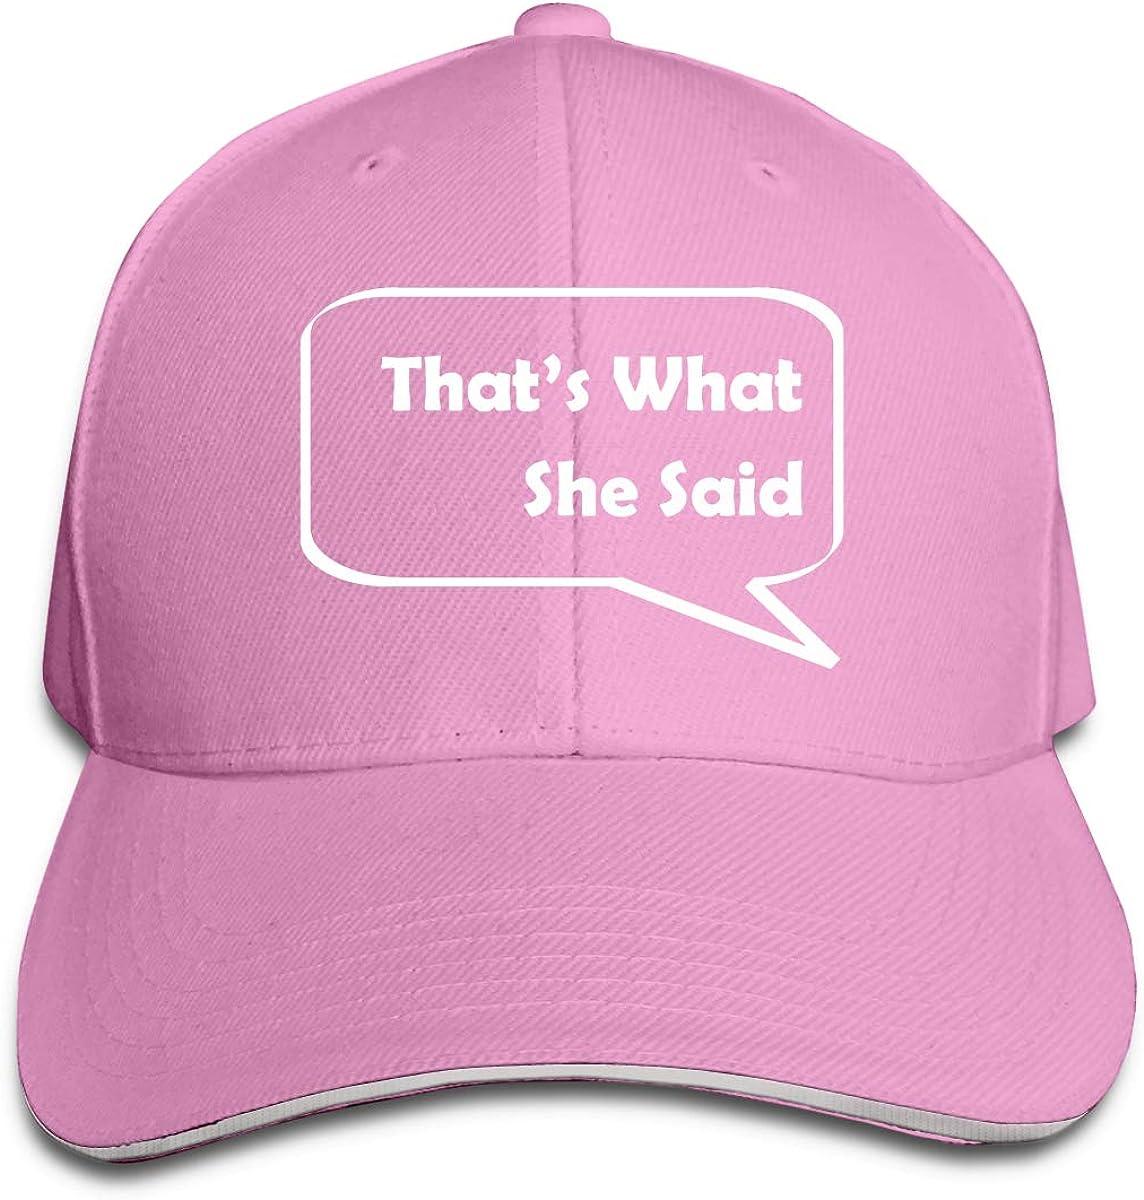 Thats What She Said Unisex Adult Baseball Caps Adjustable Sandwich Caps Jeans Caps Adjustable Denim Trucker Cap